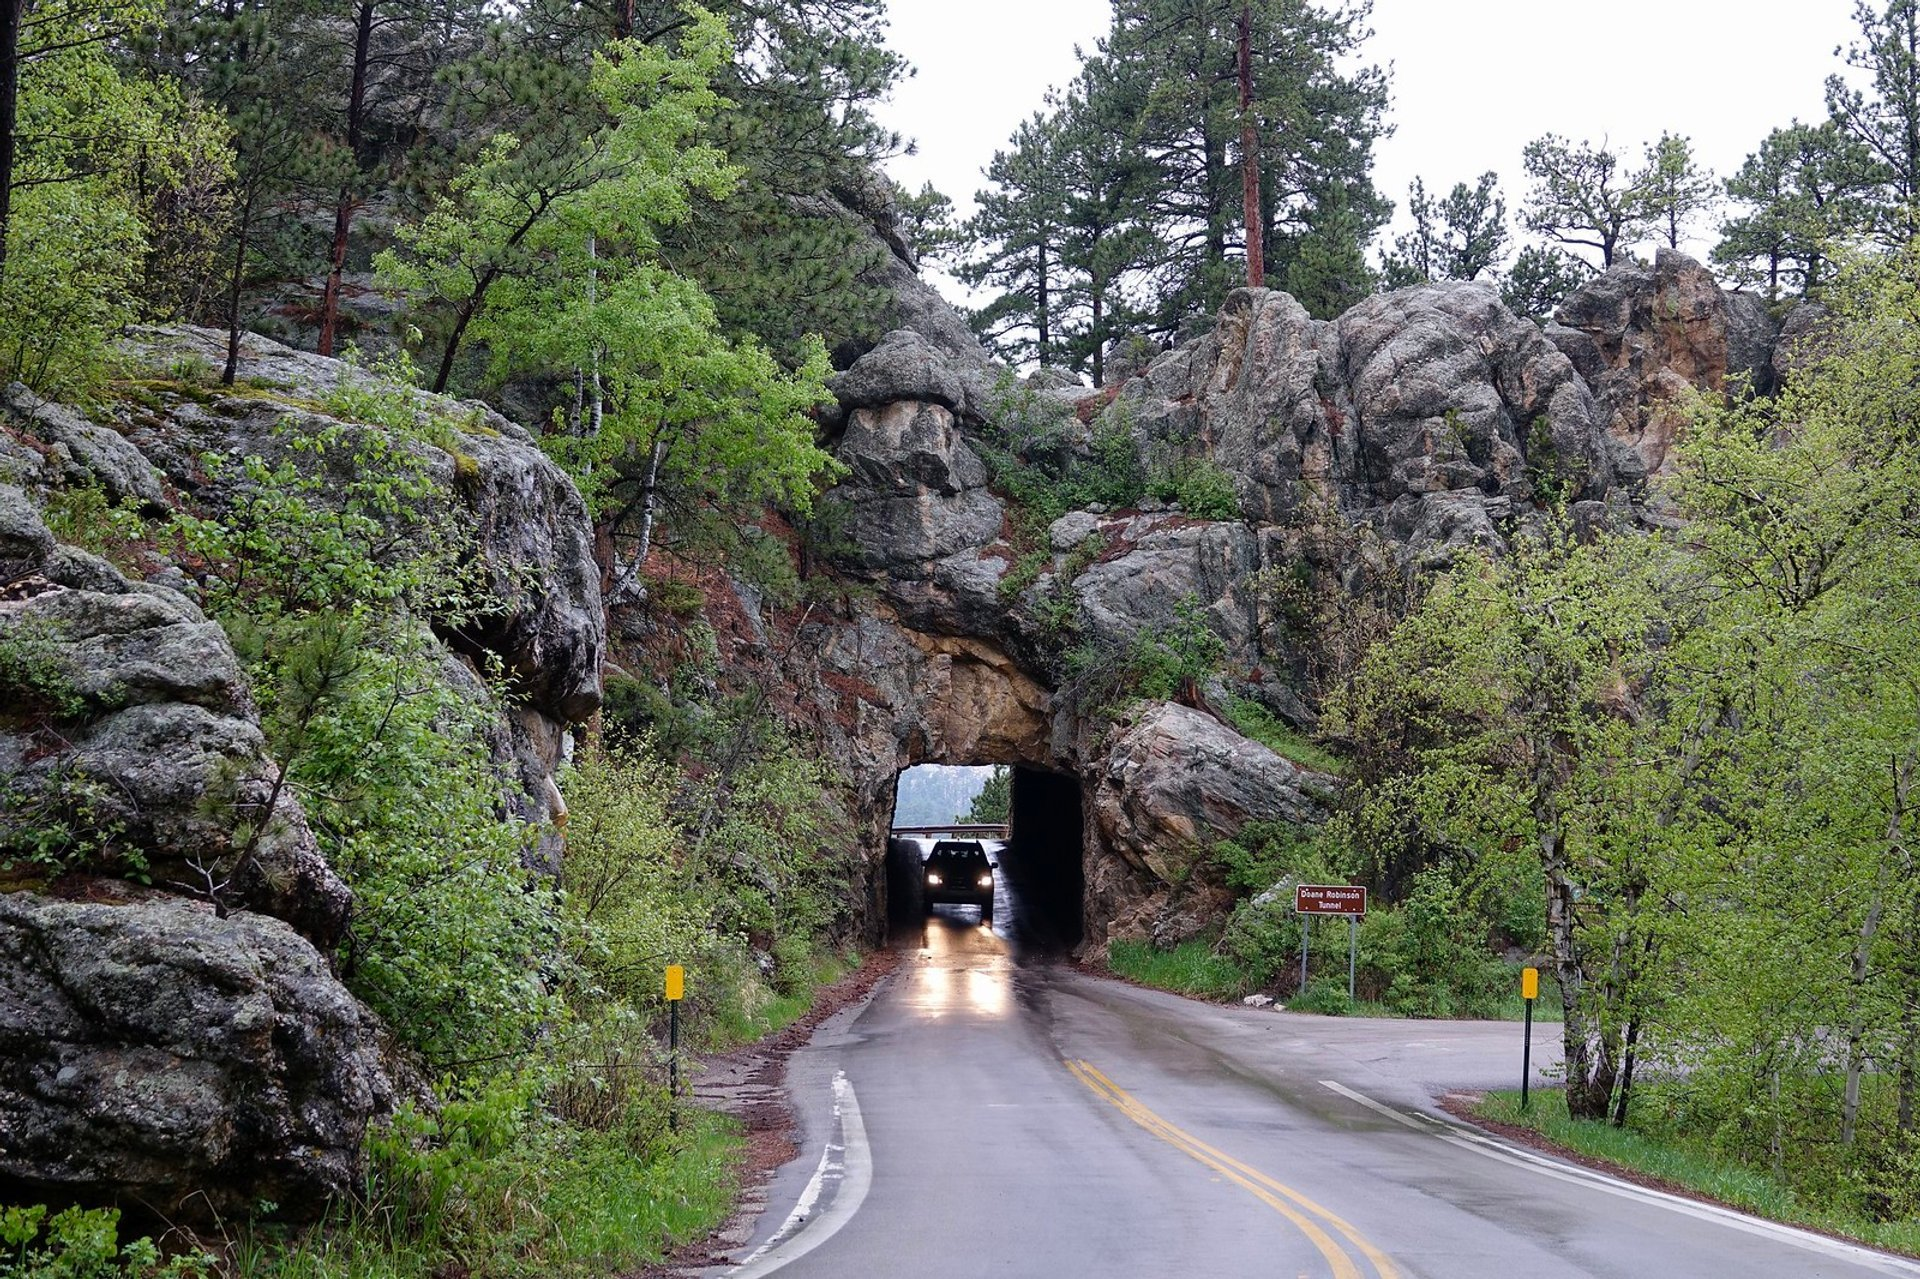 Iron Mountain Road in South Dakota 2020 - Best Time